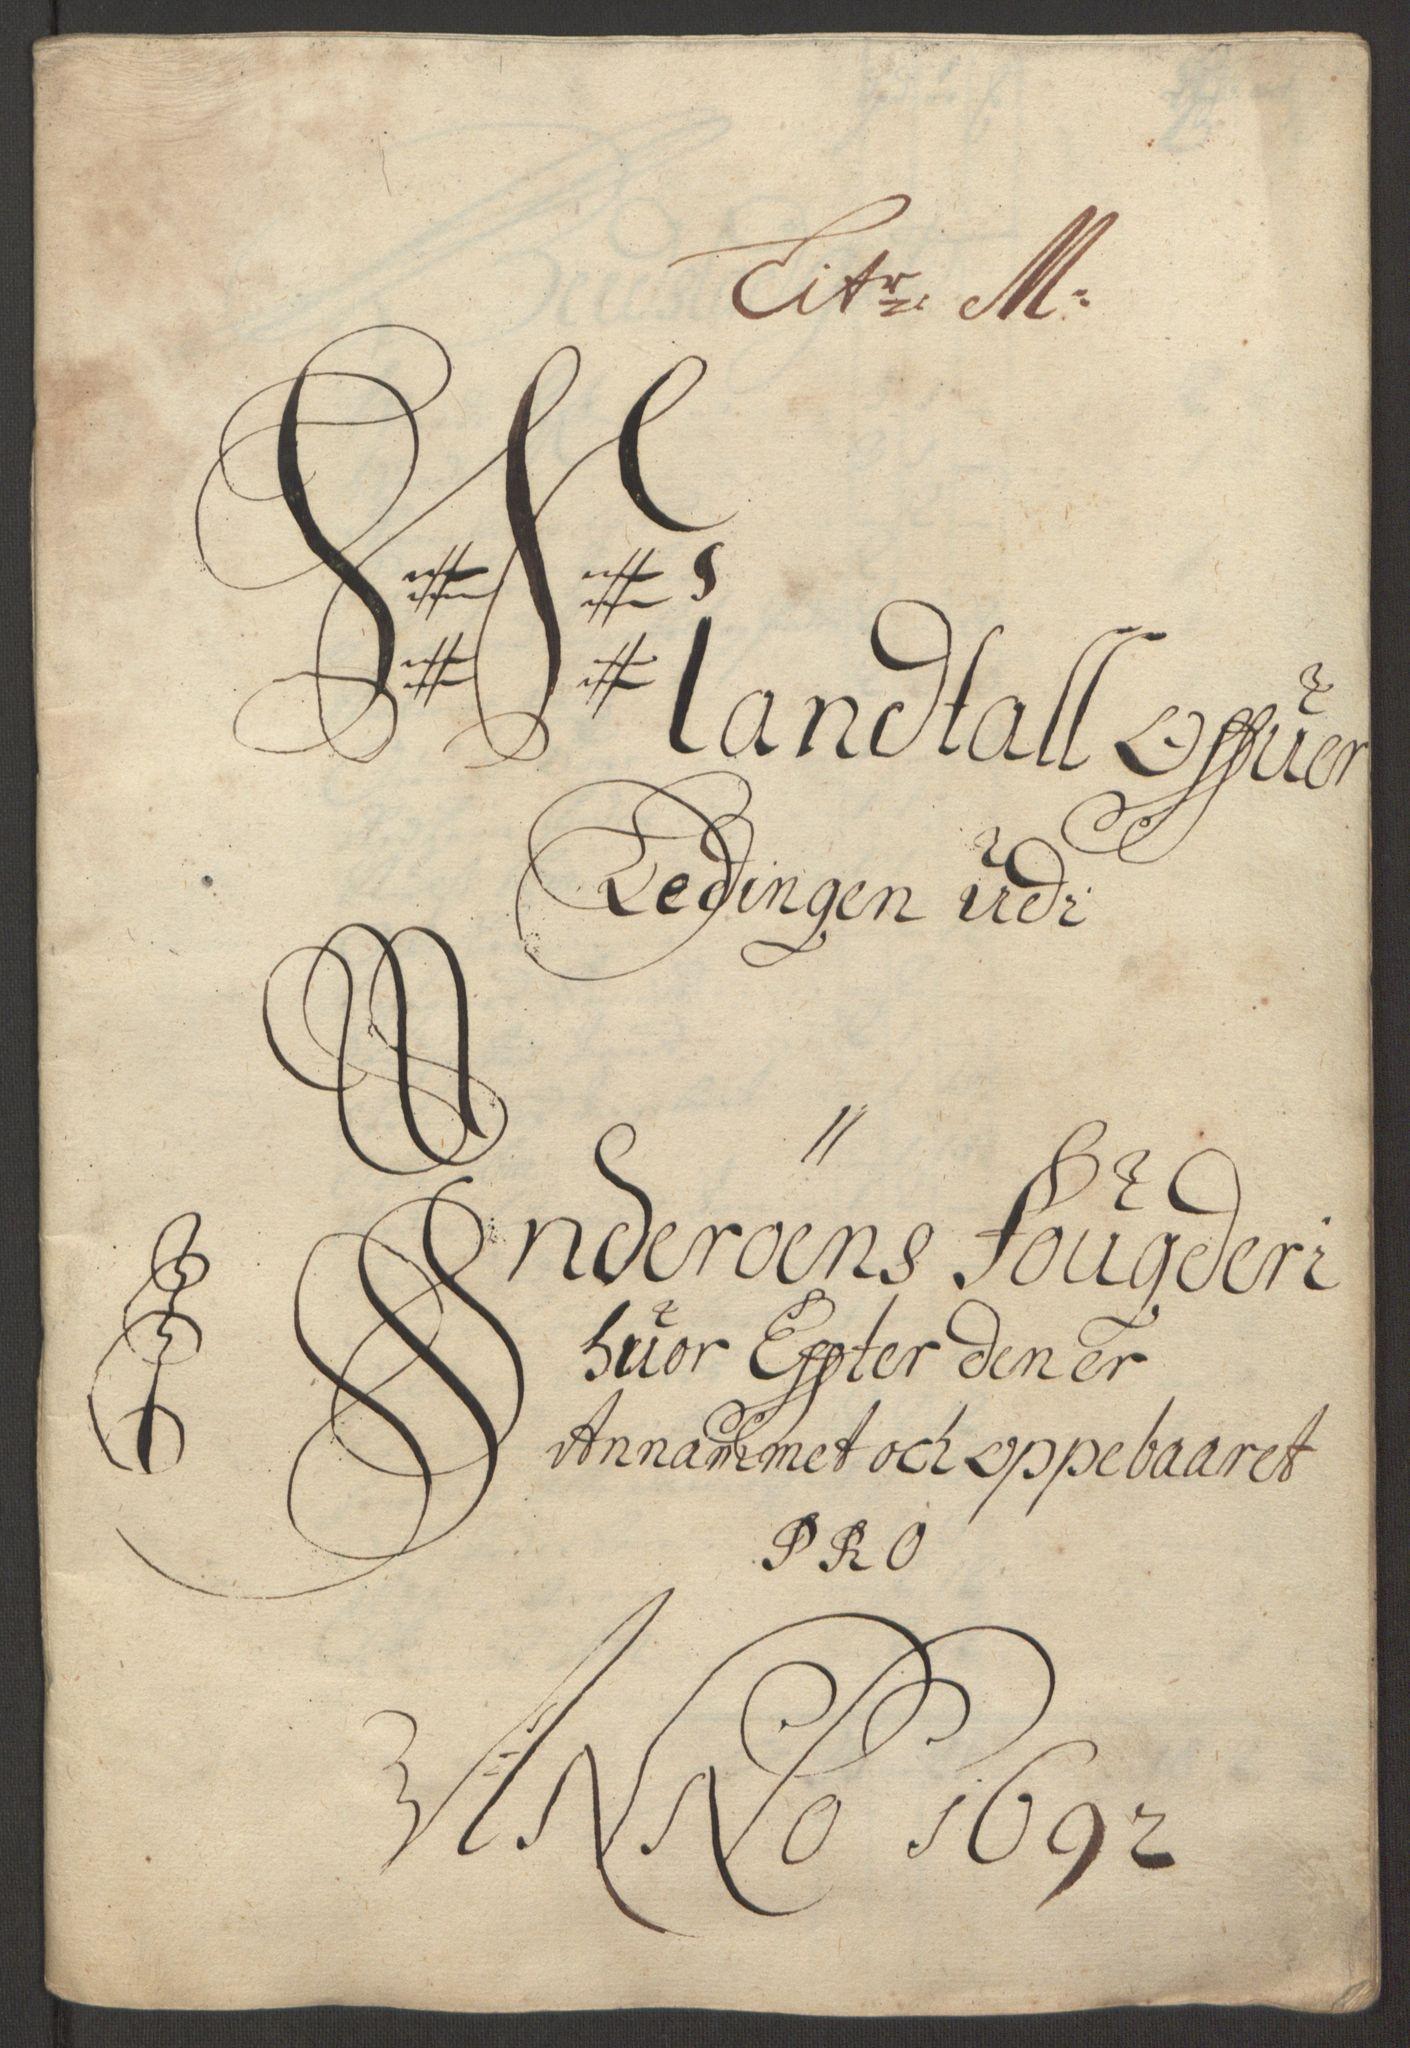 RA, Rentekammeret inntil 1814, Reviderte regnskaper, Fogderegnskap, R63/L4308: Fogderegnskap Inderøy, 1692-1694, s. 171